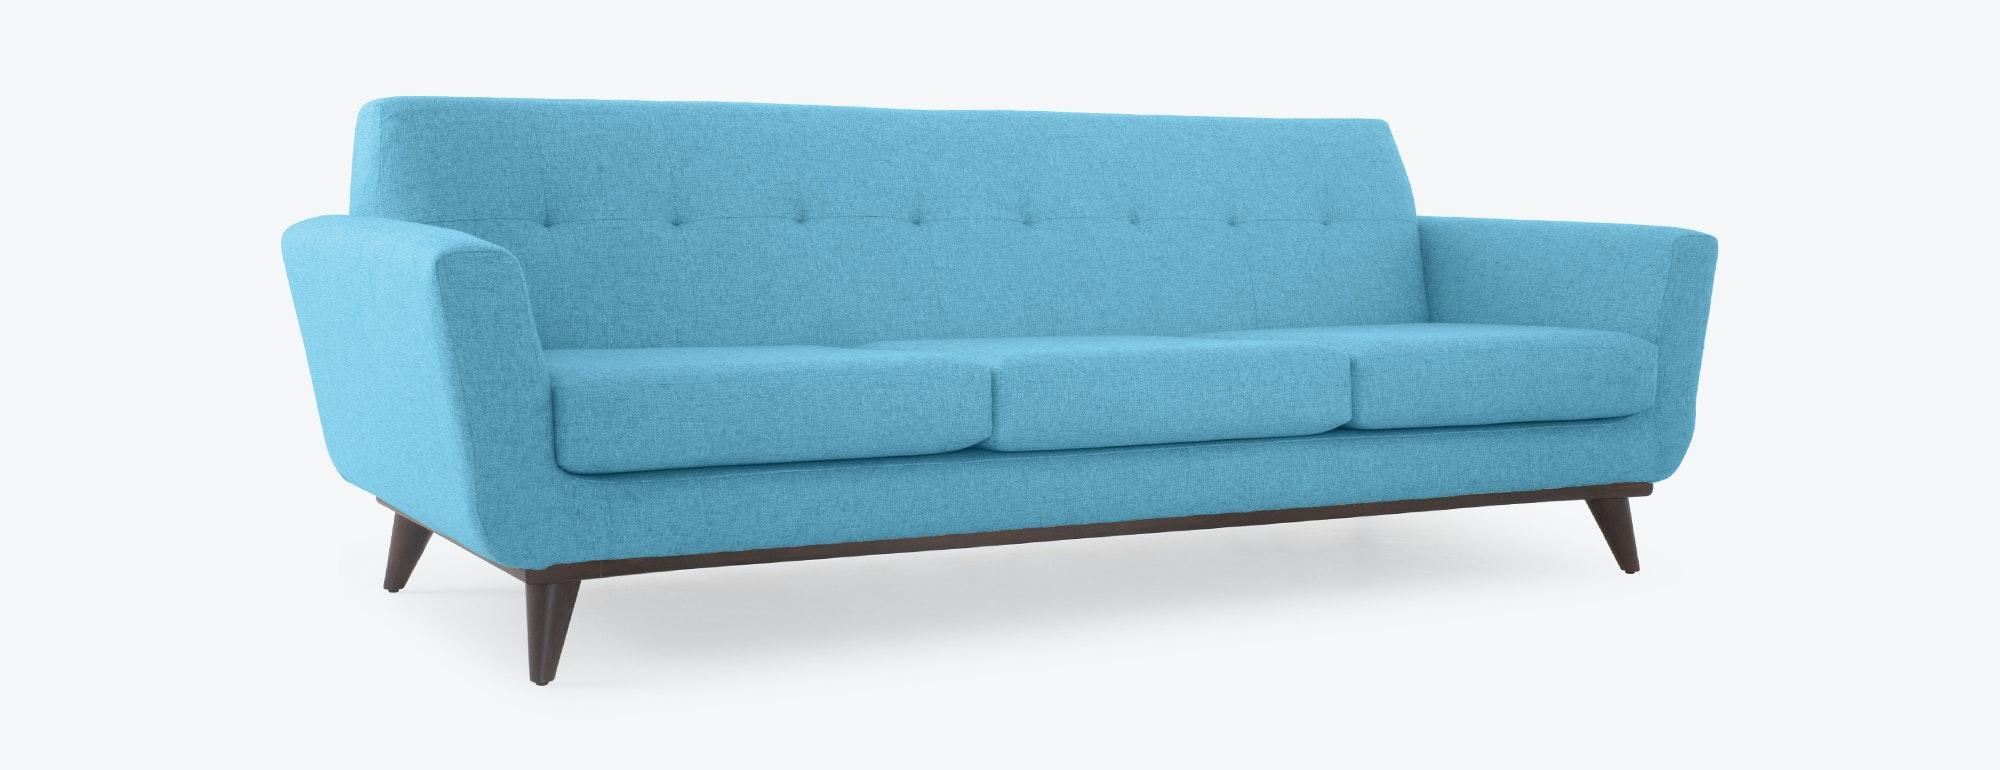 grand sofa make a wrap cover hughes joybird